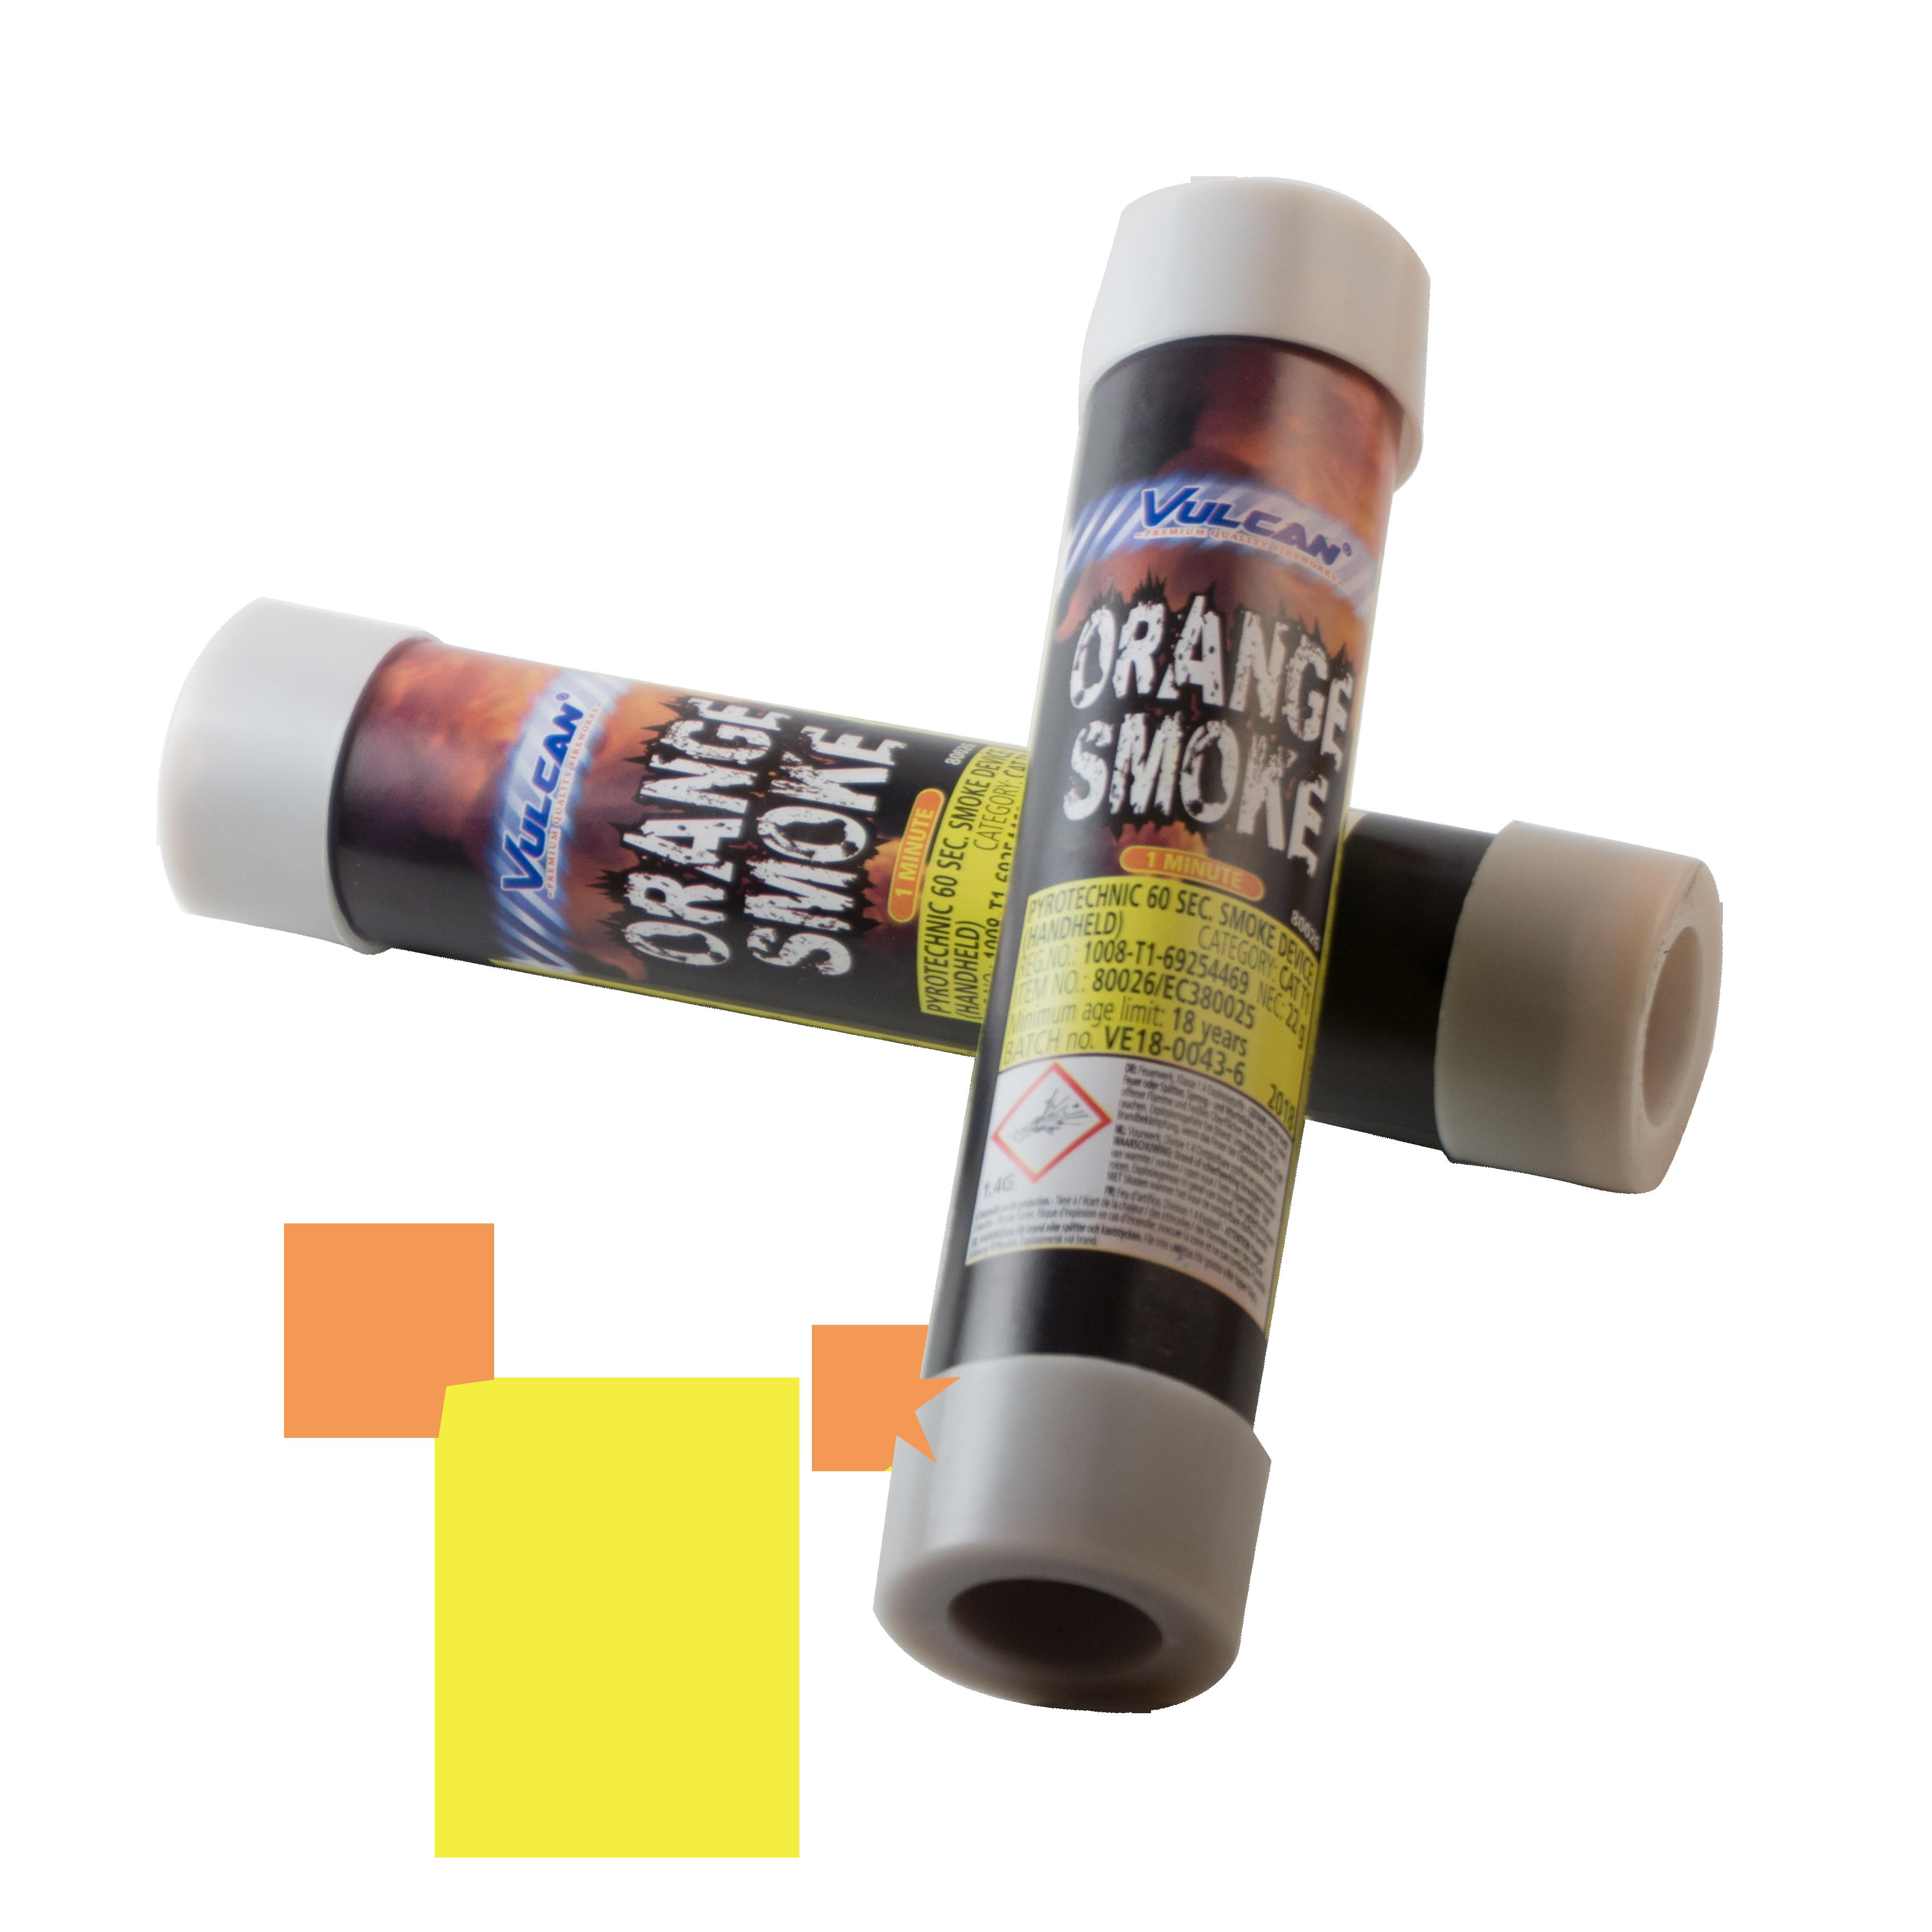 Smoke Device Orange – 60 sec Vulcan Collection